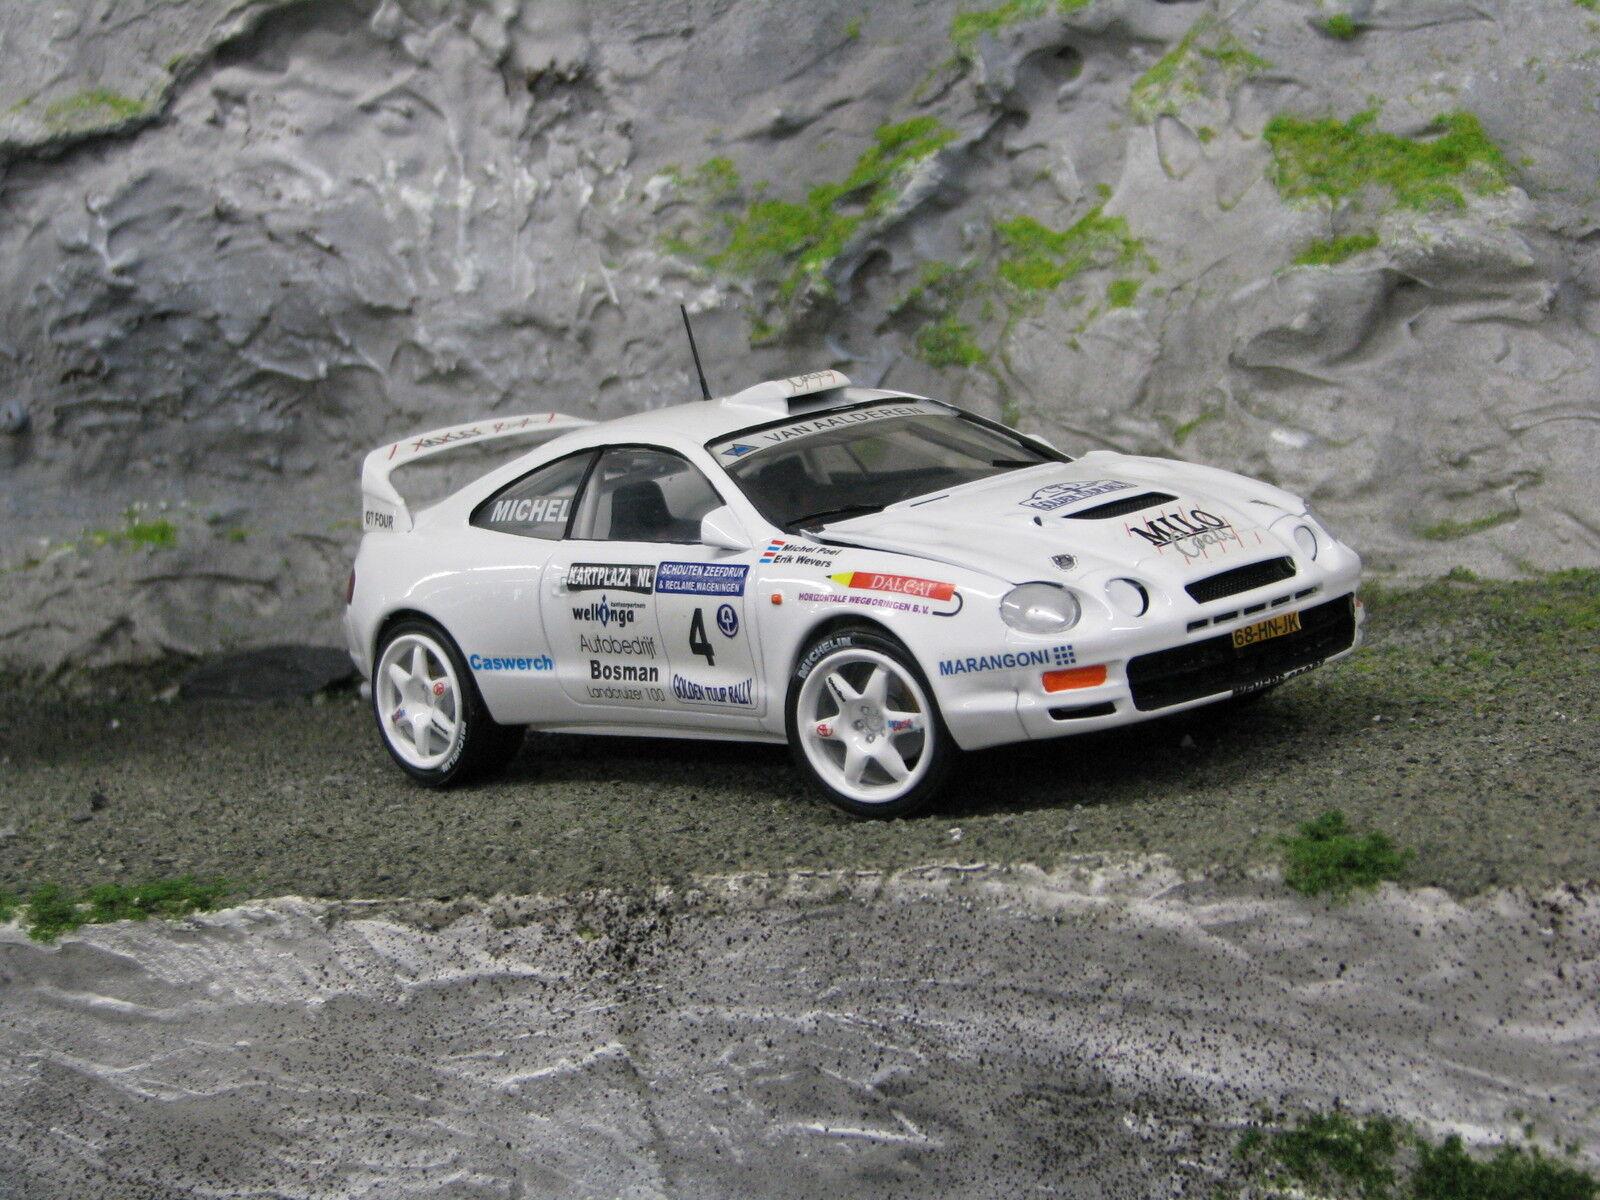 QSP Toyota Celica GT-Four 1995 1 24  4 Wevers   Poel oroen Tulip Rally 2001